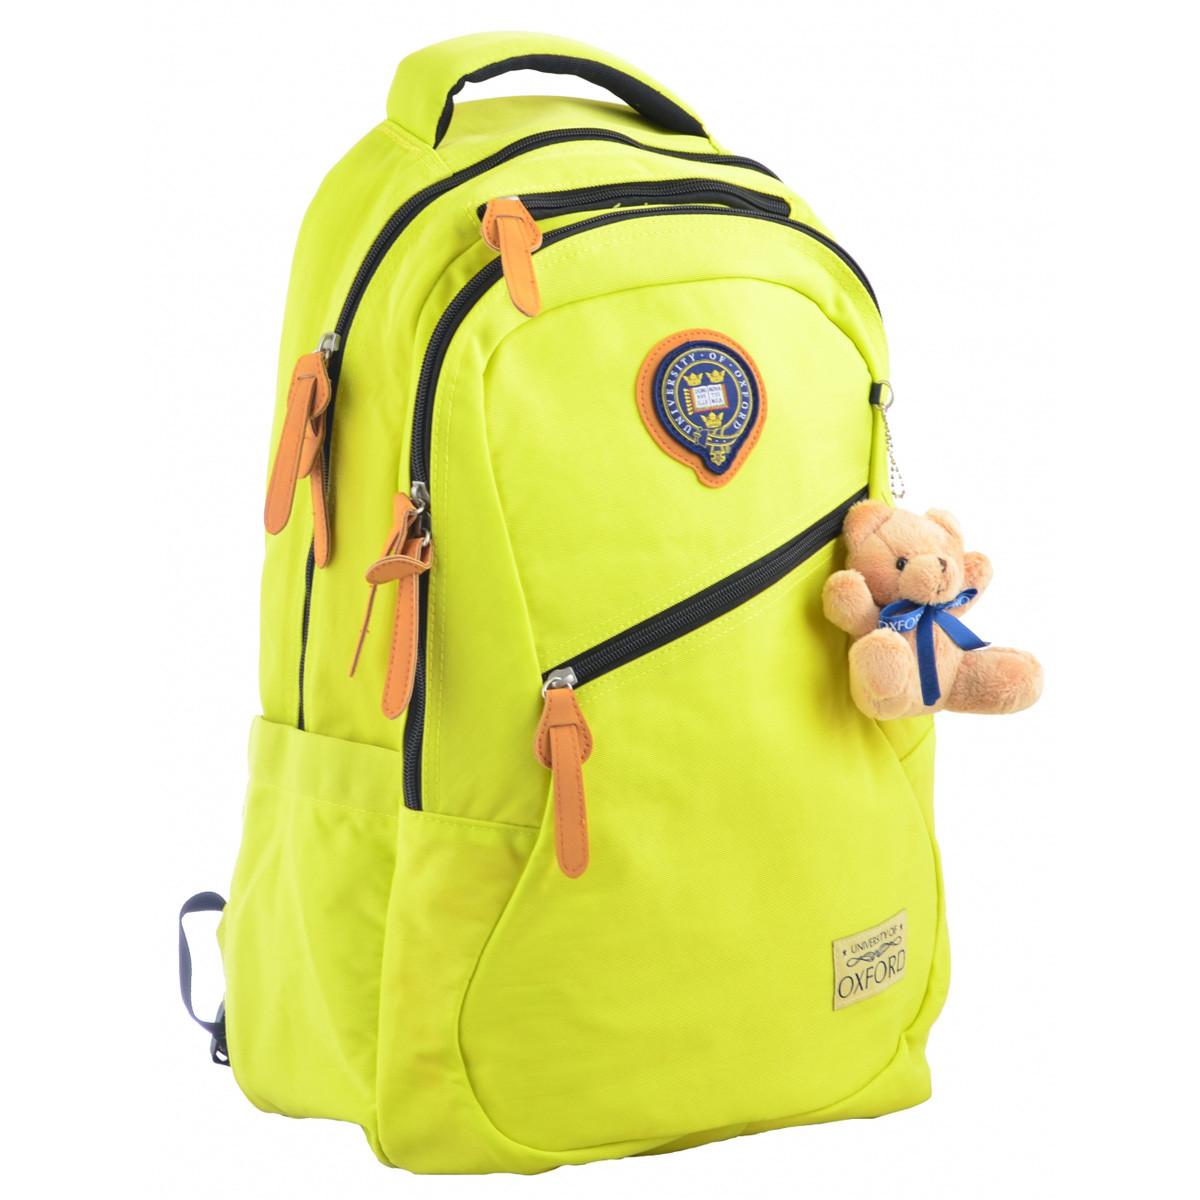 Рюкзак городской YES OX 405 47*31*12.5 желтый код: 555685